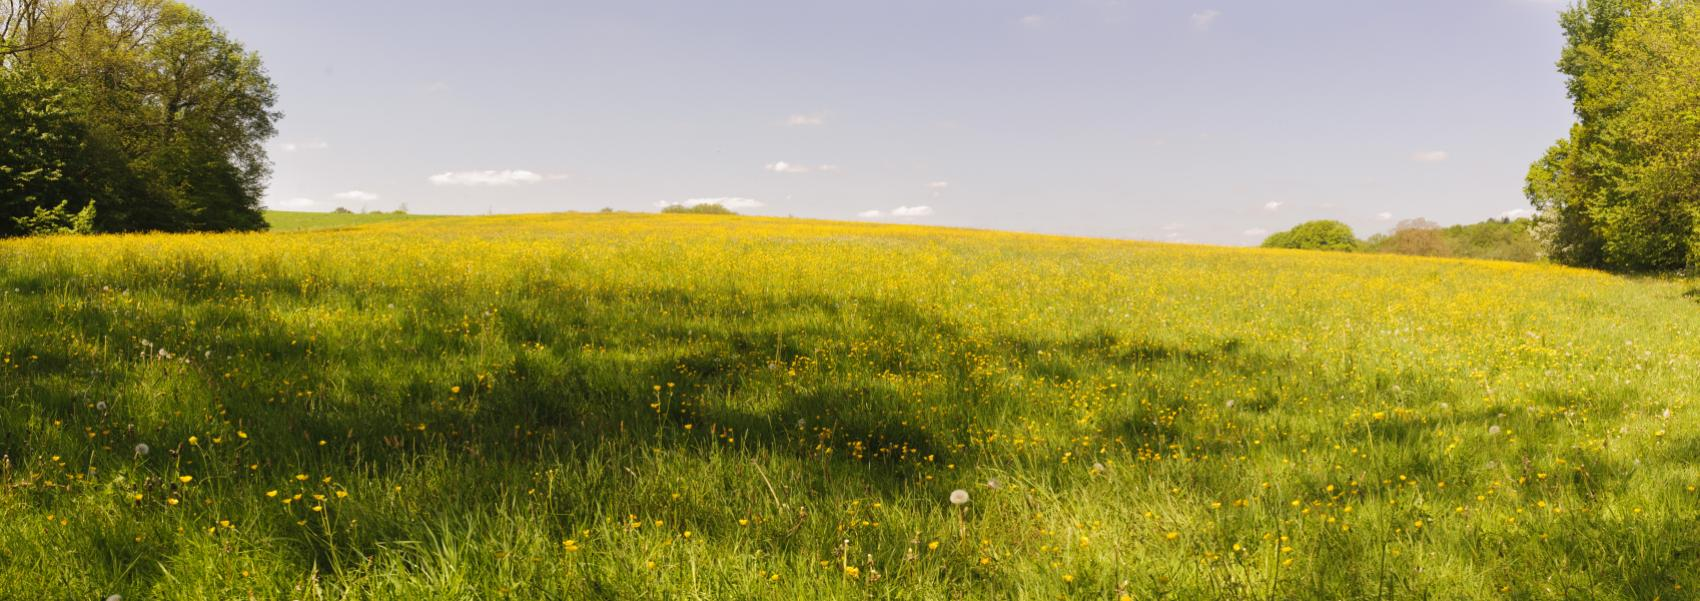 bloemen- en grasweide